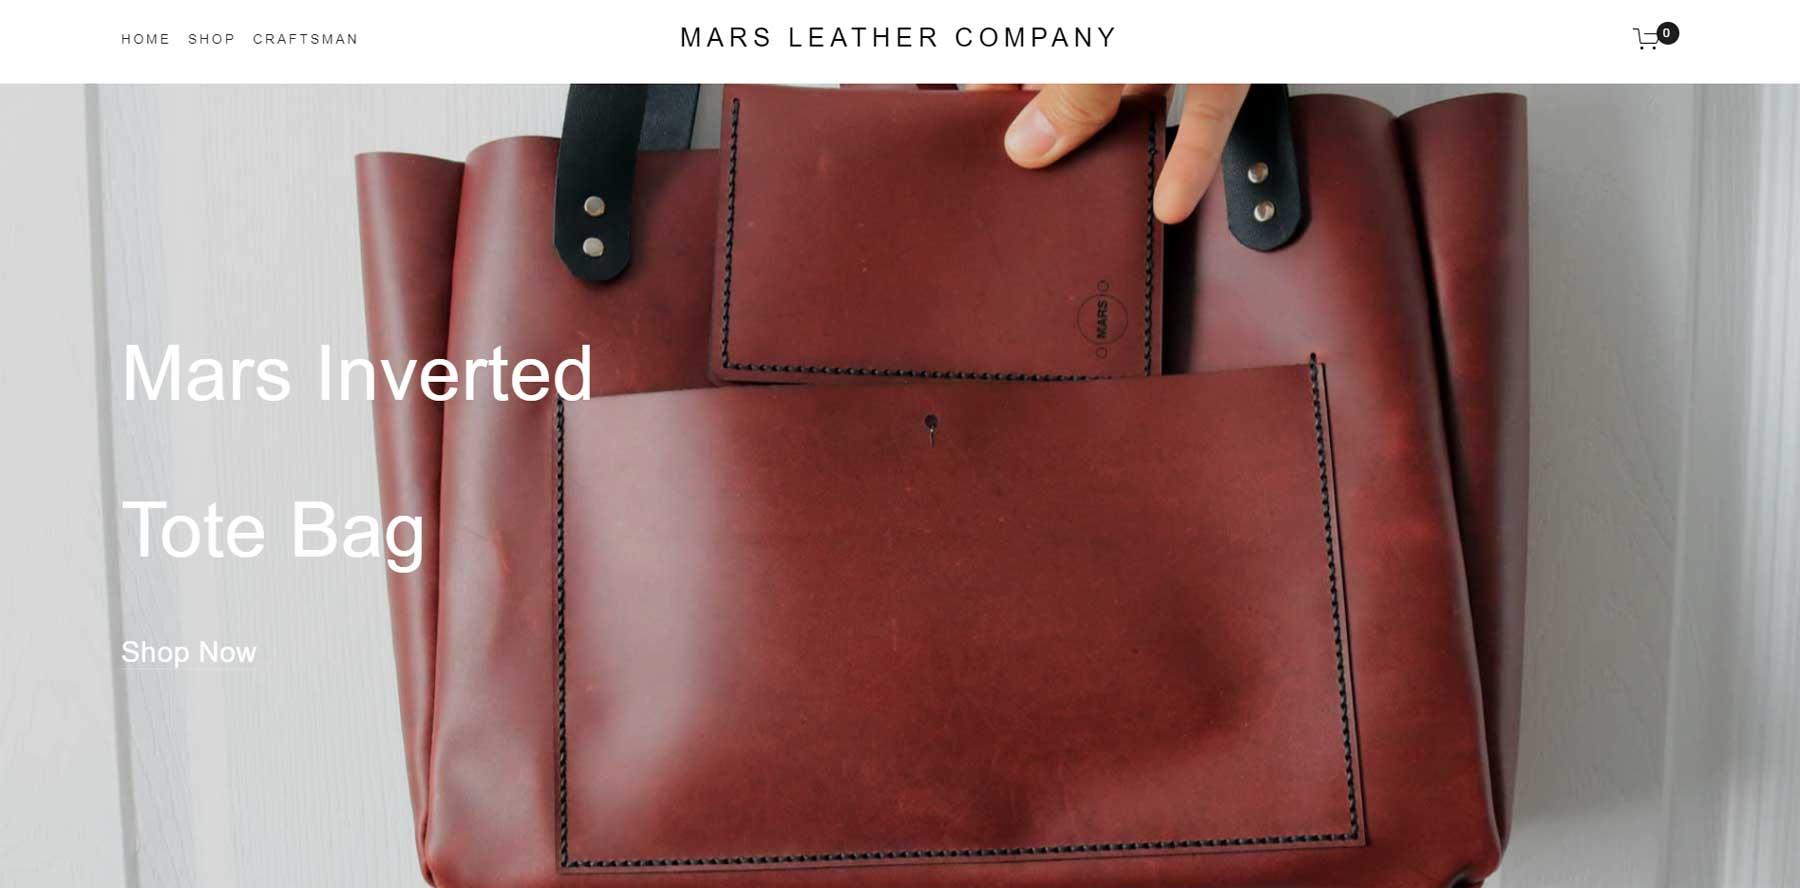 Mars-leather-Company-Website.jpg